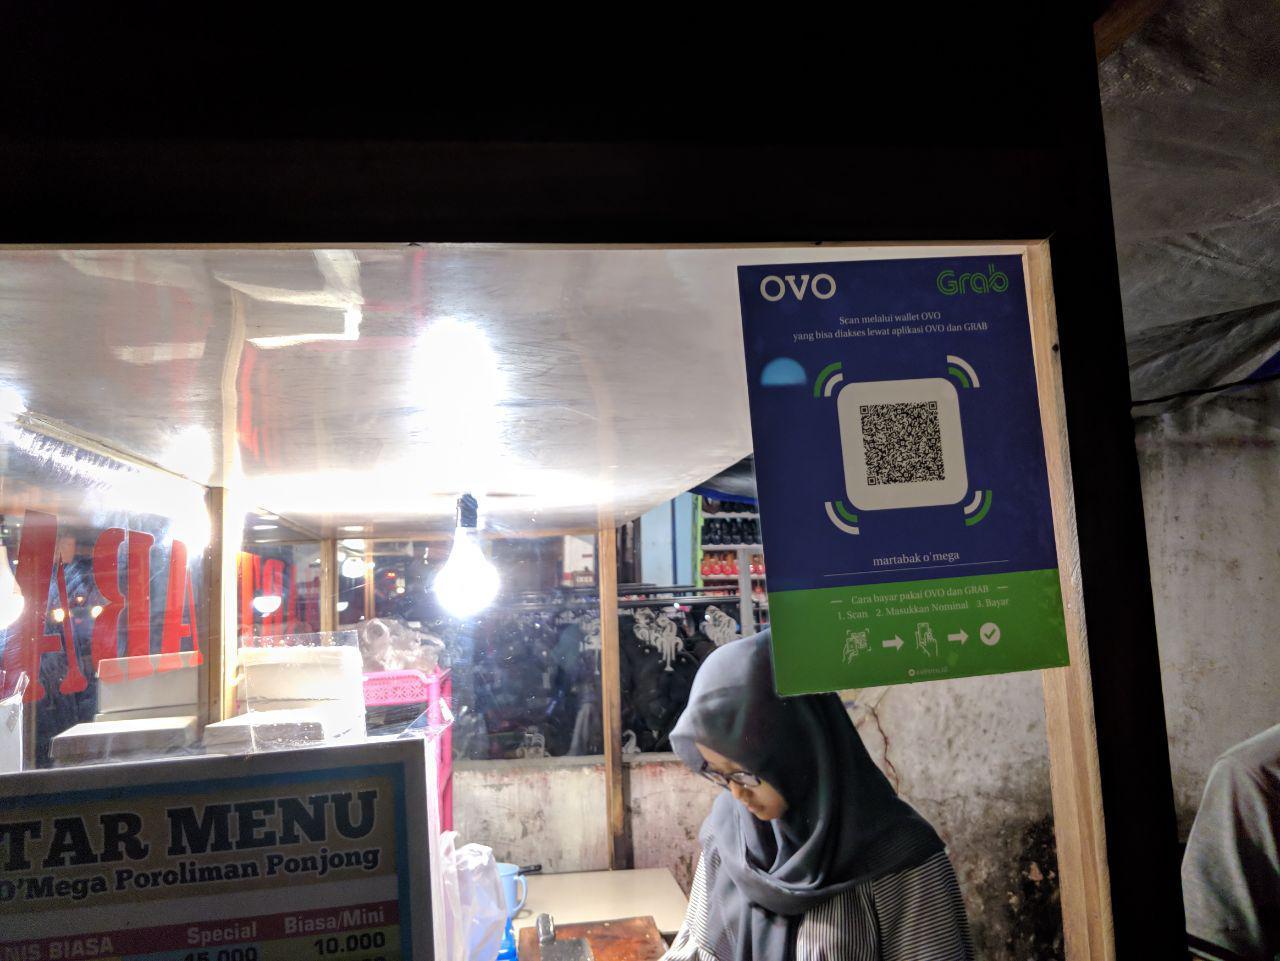 Martabak Omega Proliman Ponjong bayar dengan OVO